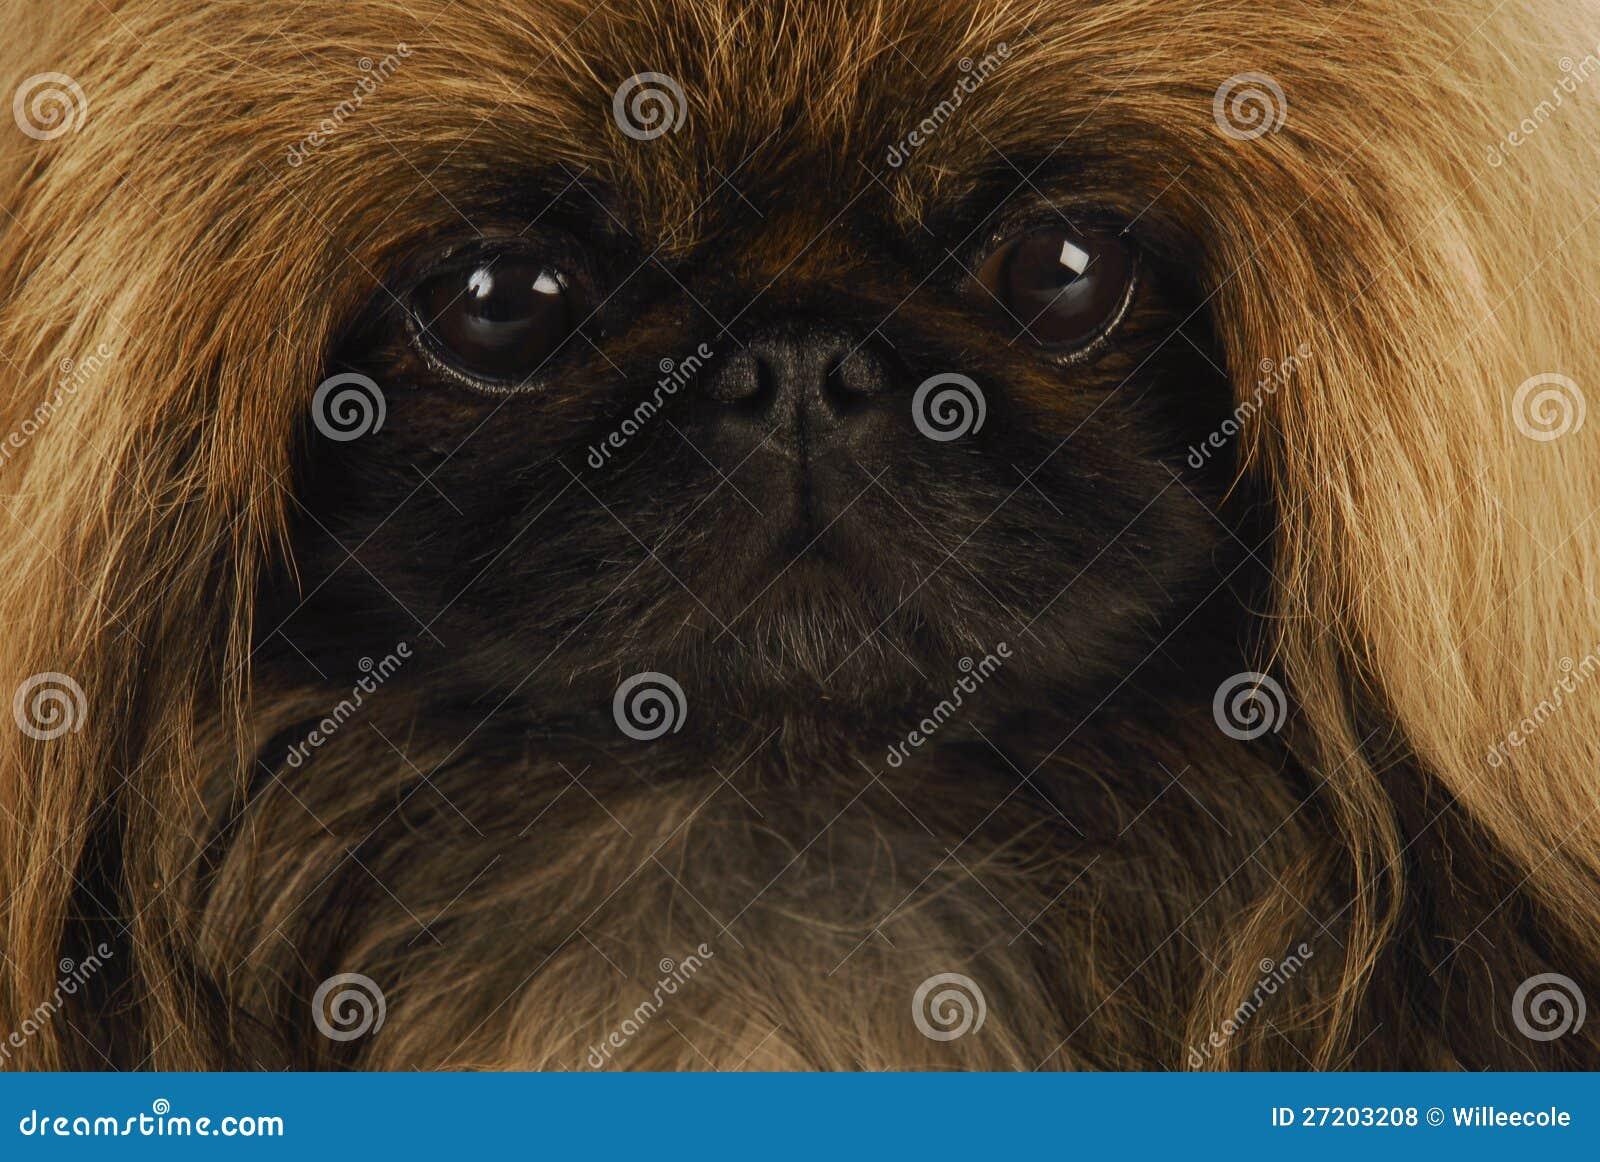 Pekingese face